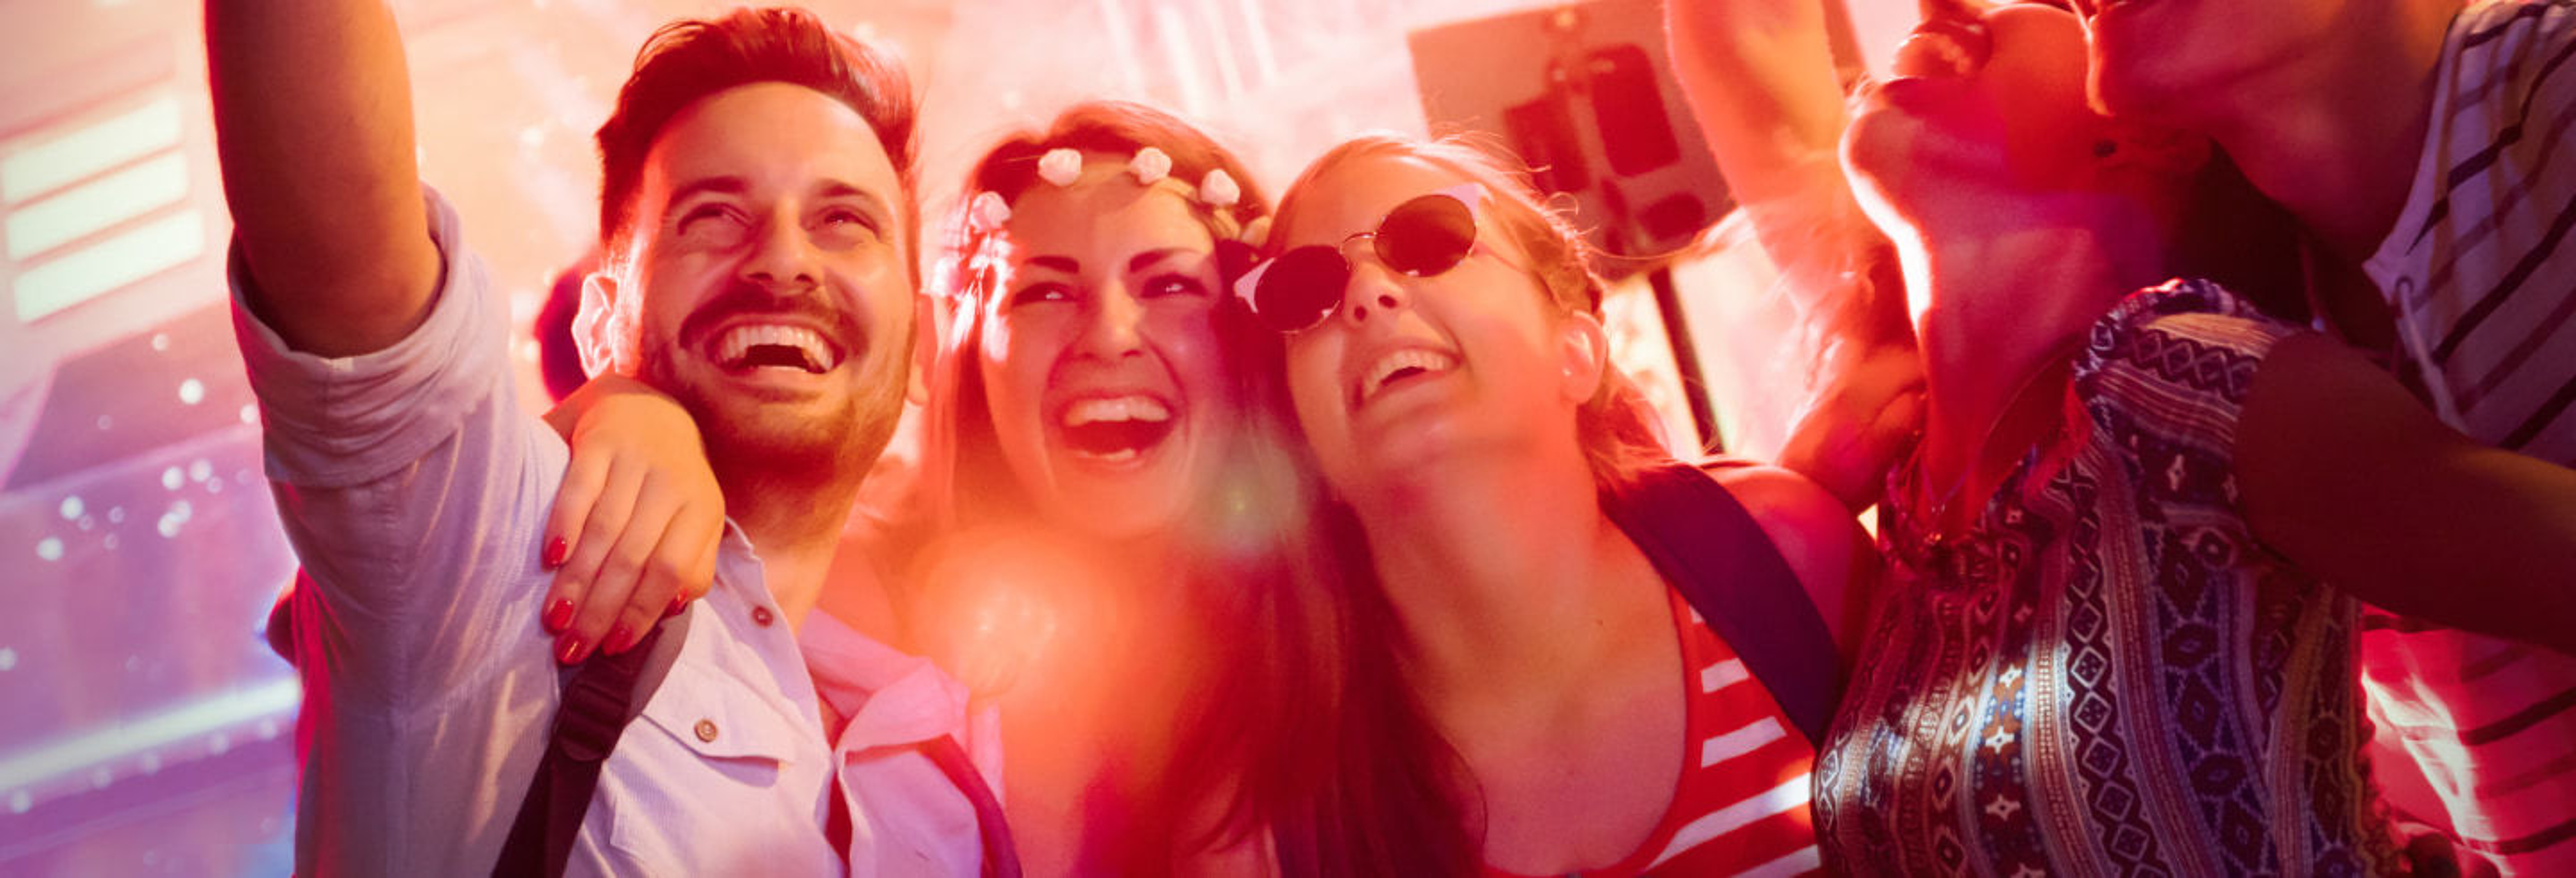 Pub crawl ¡Tour de fiesta por Oporto!